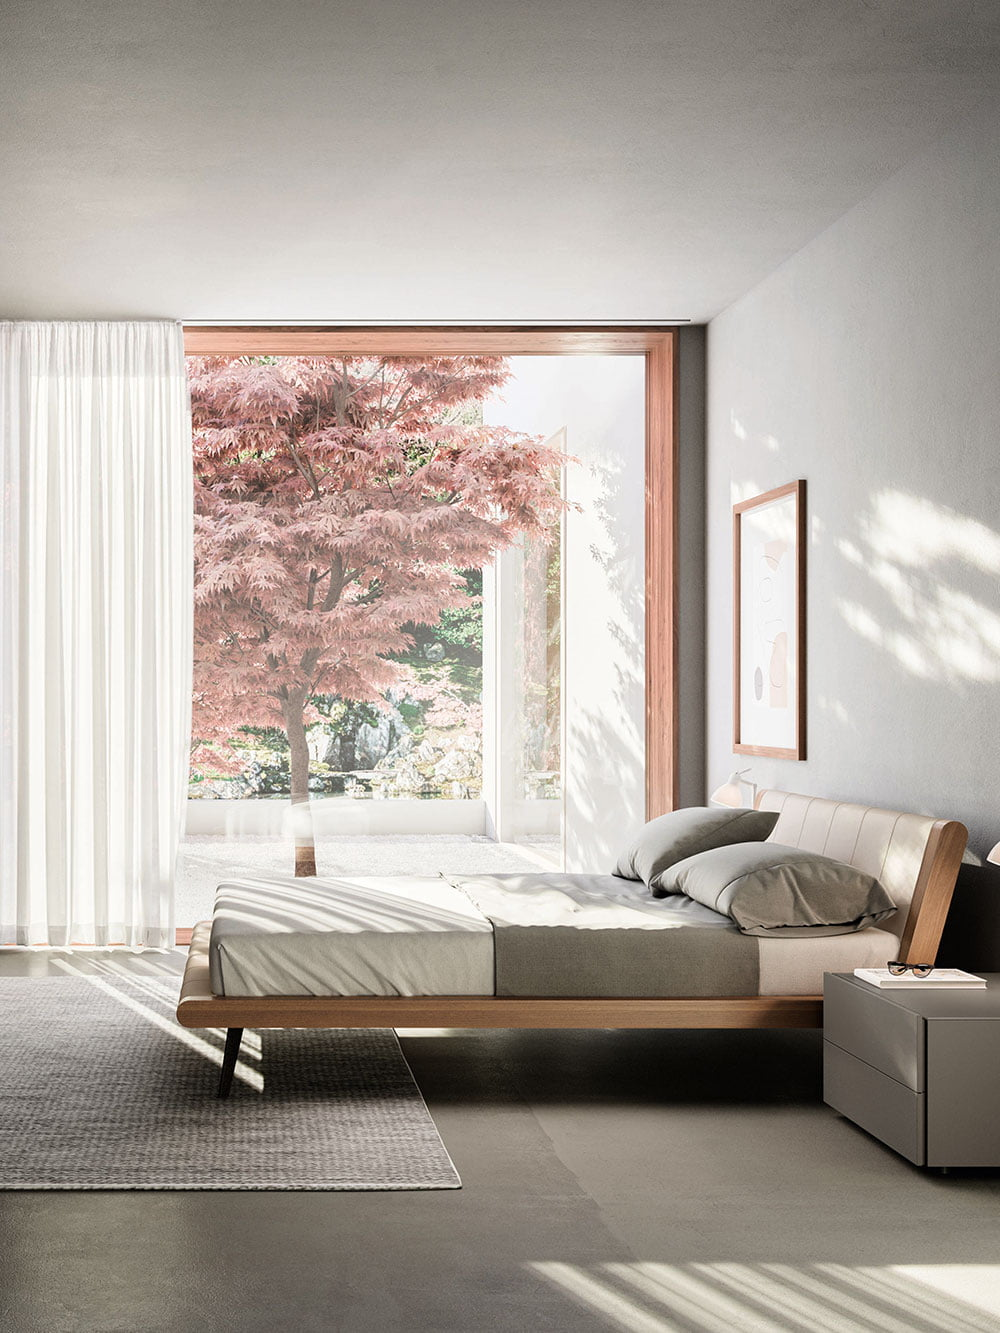 Gyles_004-Bed